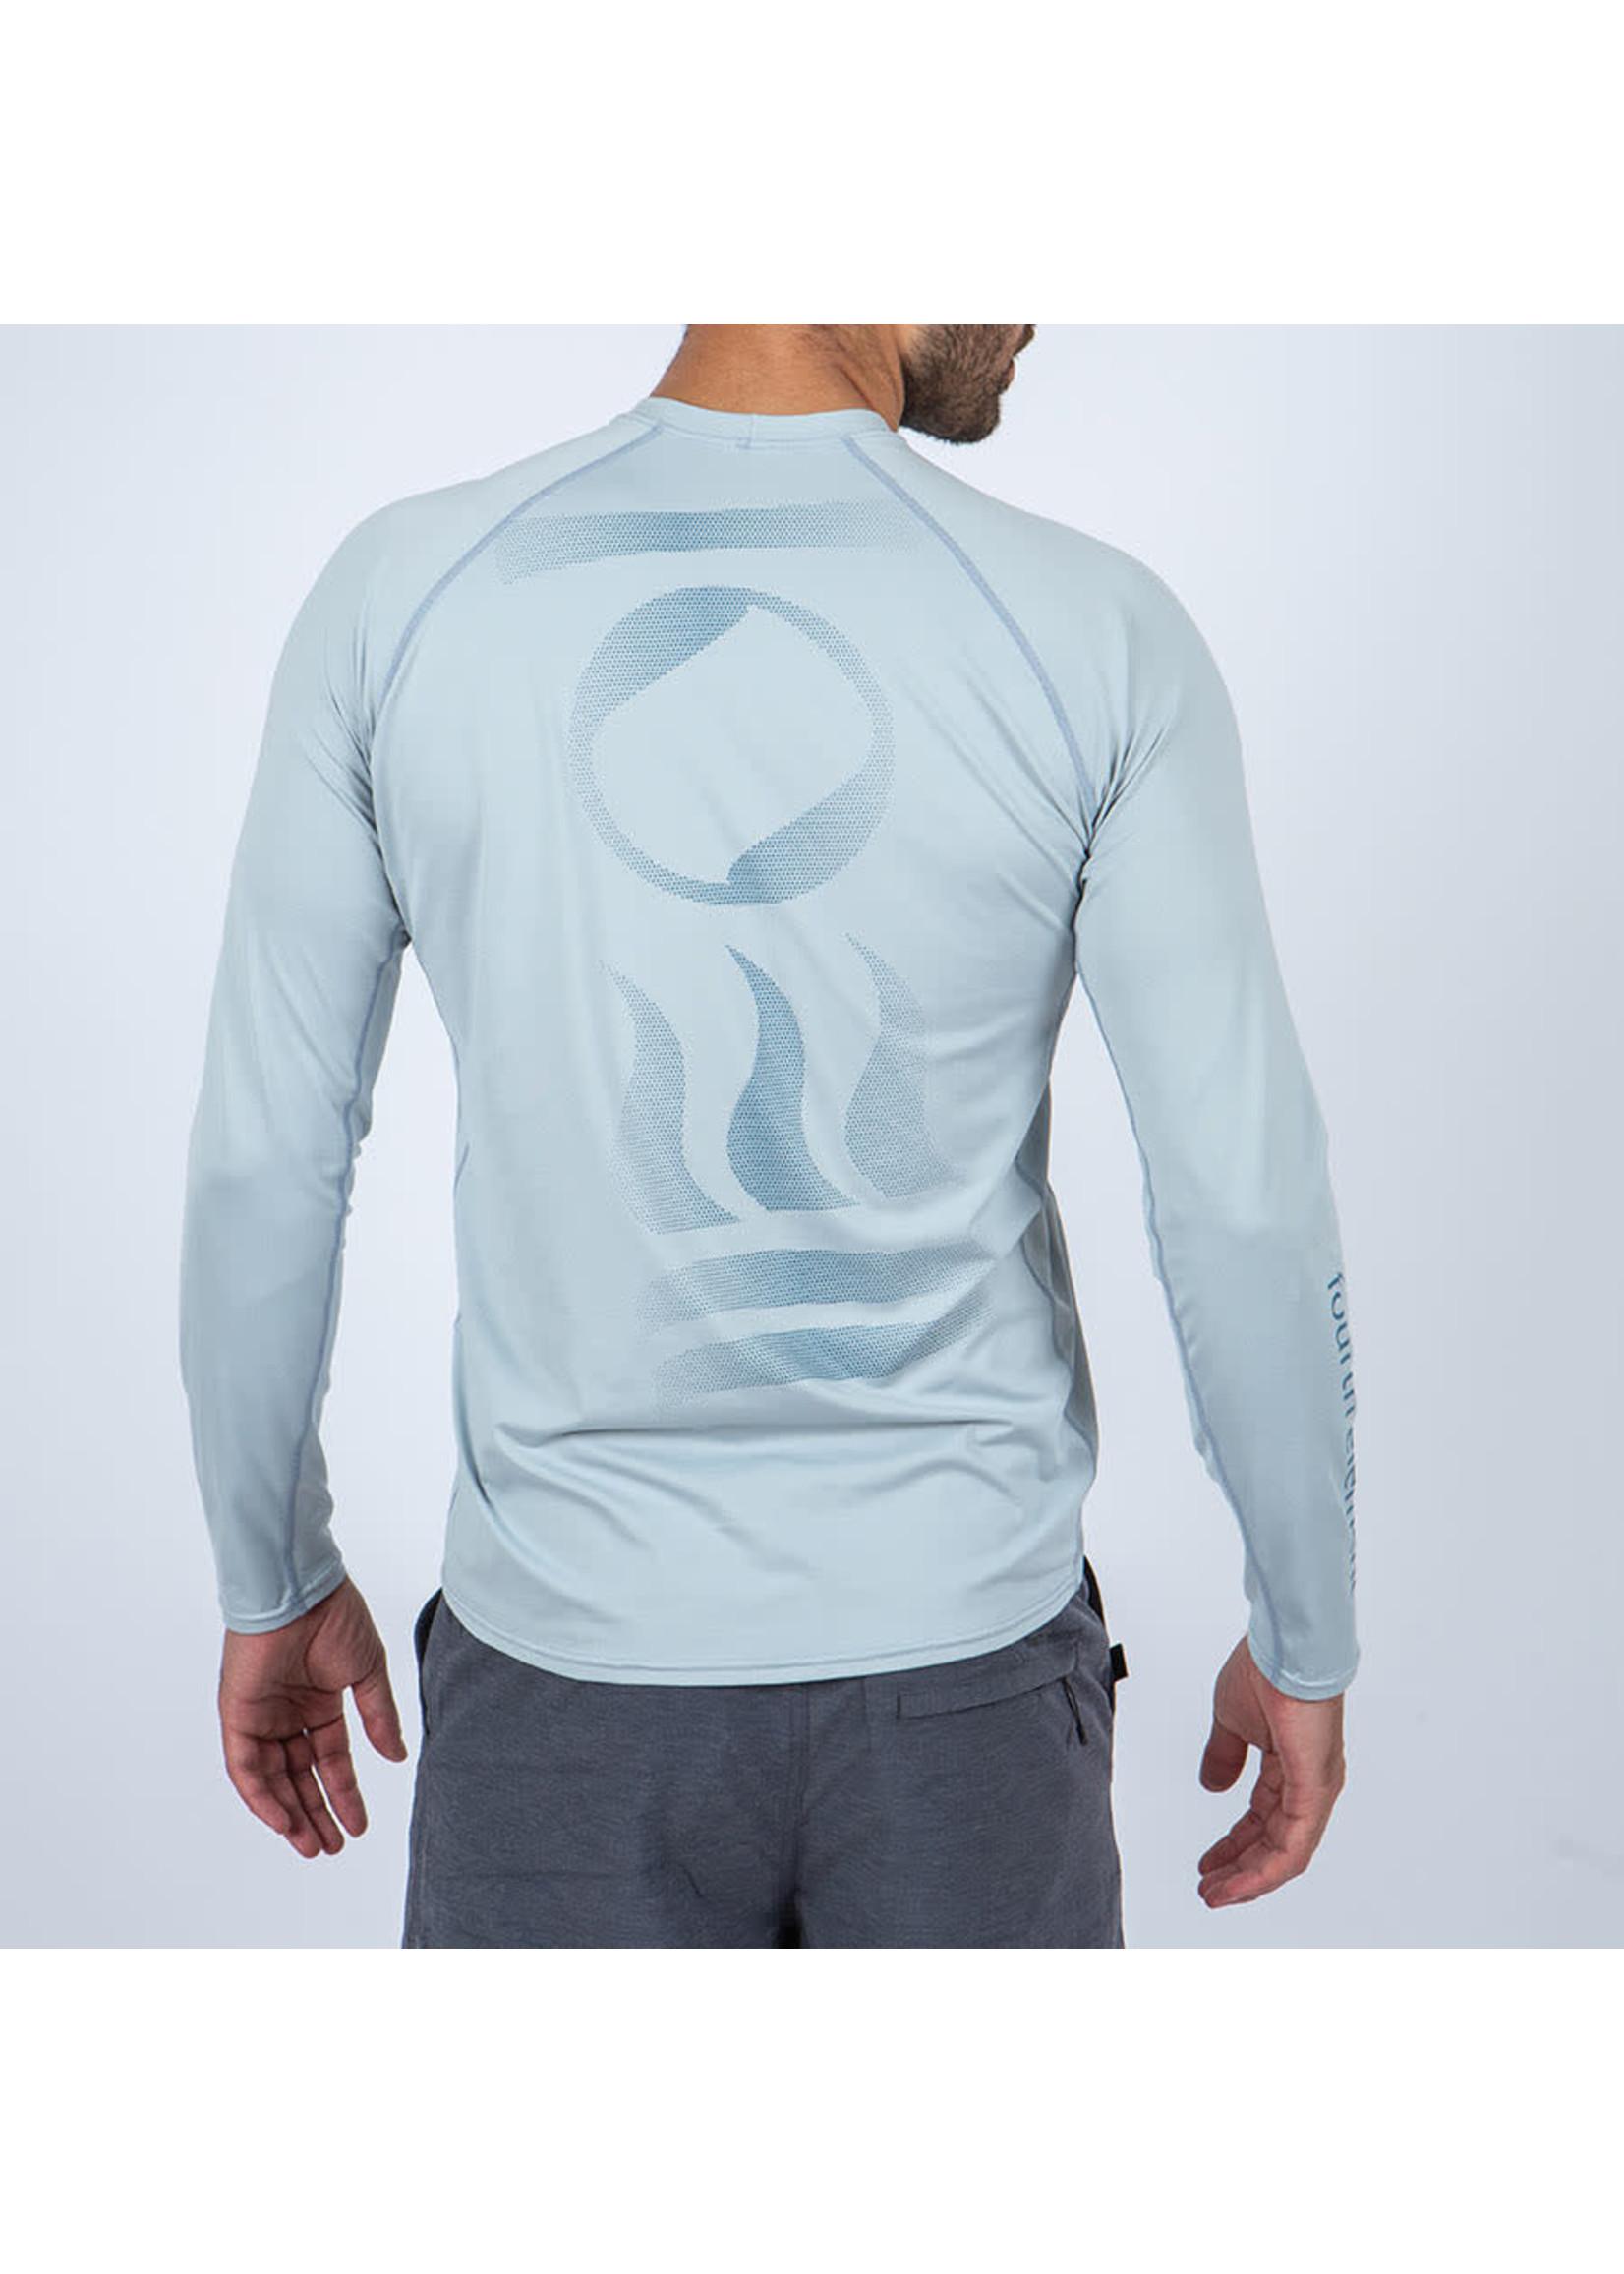 Fourth Element Fourth Element Hydro-T Long Sleeve Ice Blue - man